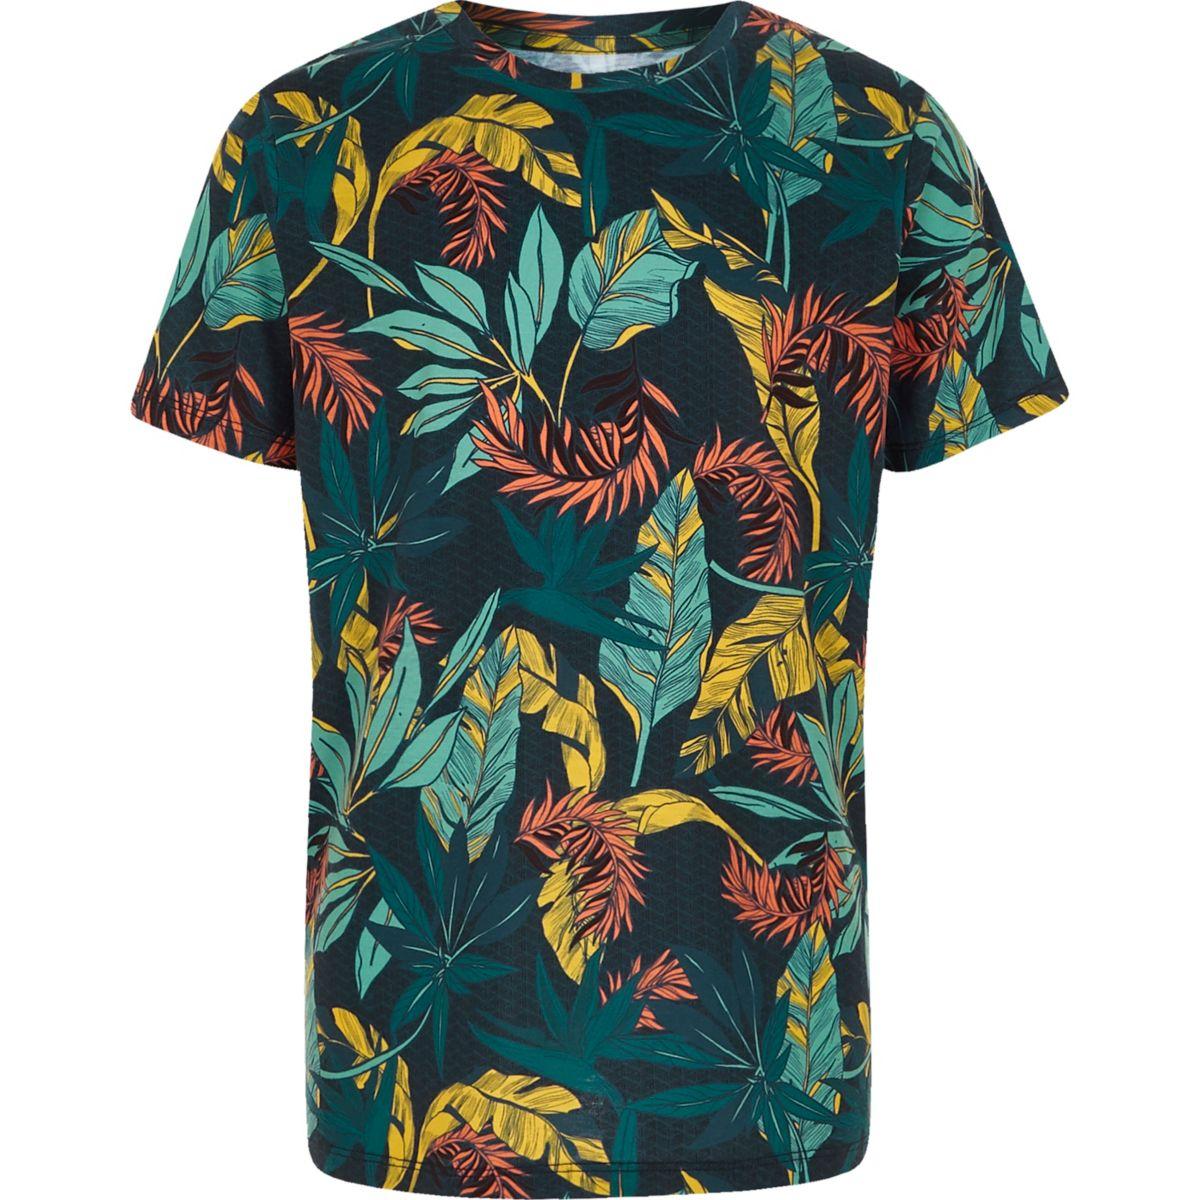 Boys navy floral print T-shirt